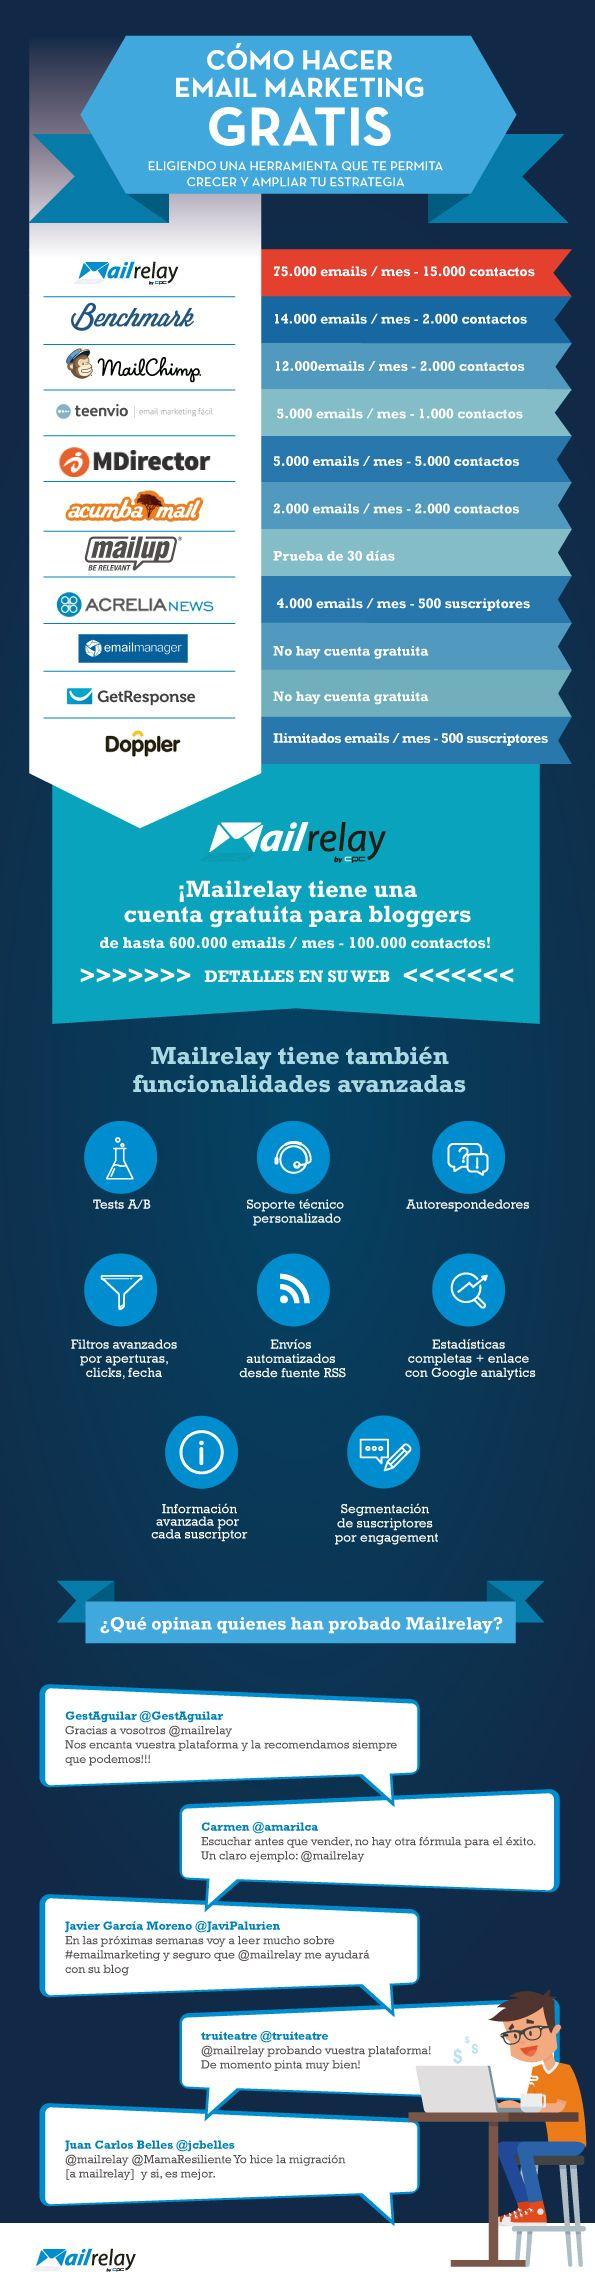 Cómo hacer email marketing gratis #infografia #emailmarketing